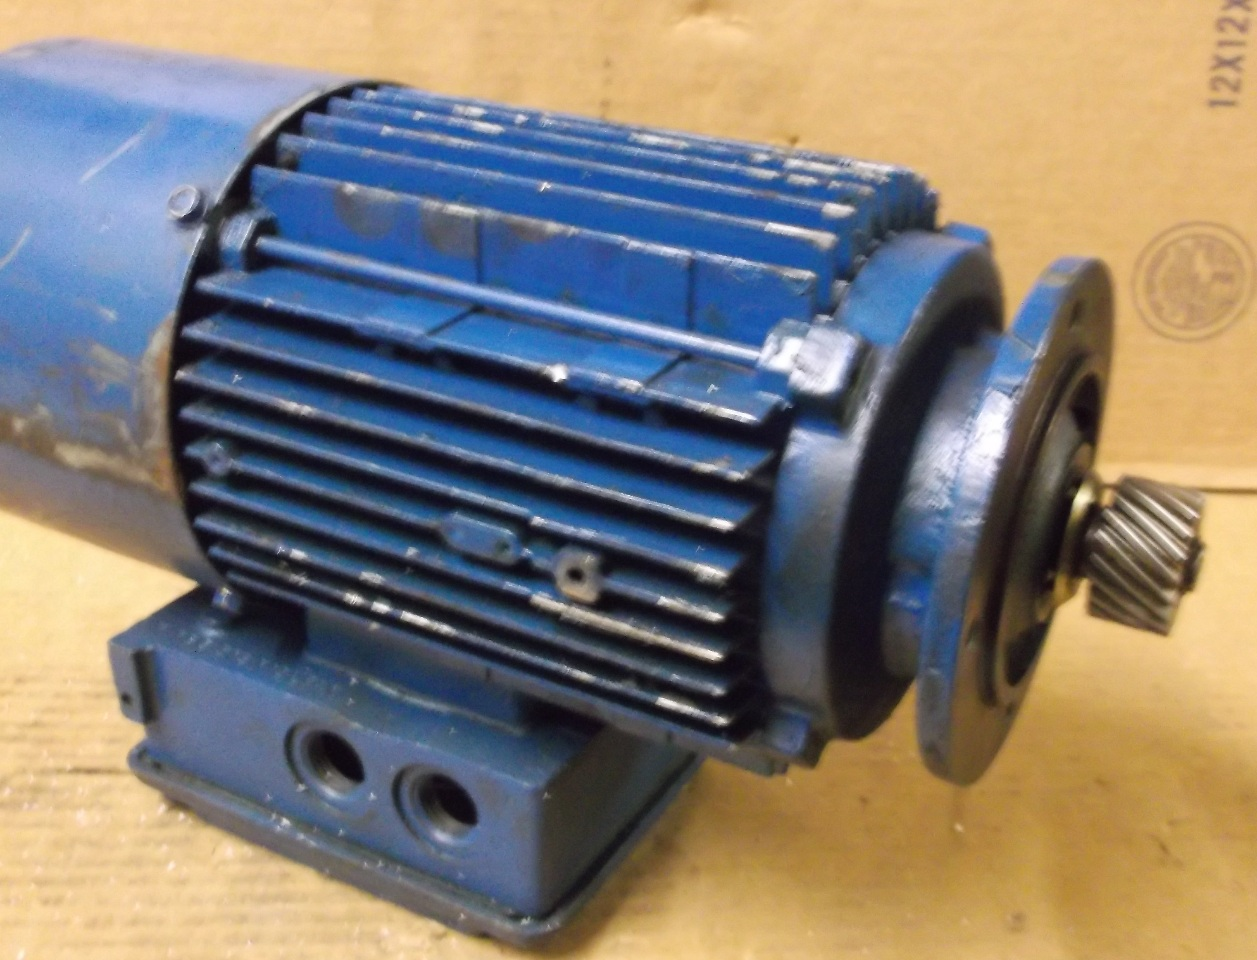 Sew eurodrive motor dft80k4bmg1hrz 75hp 1700 rpm 3 ph for Sew motors and drives